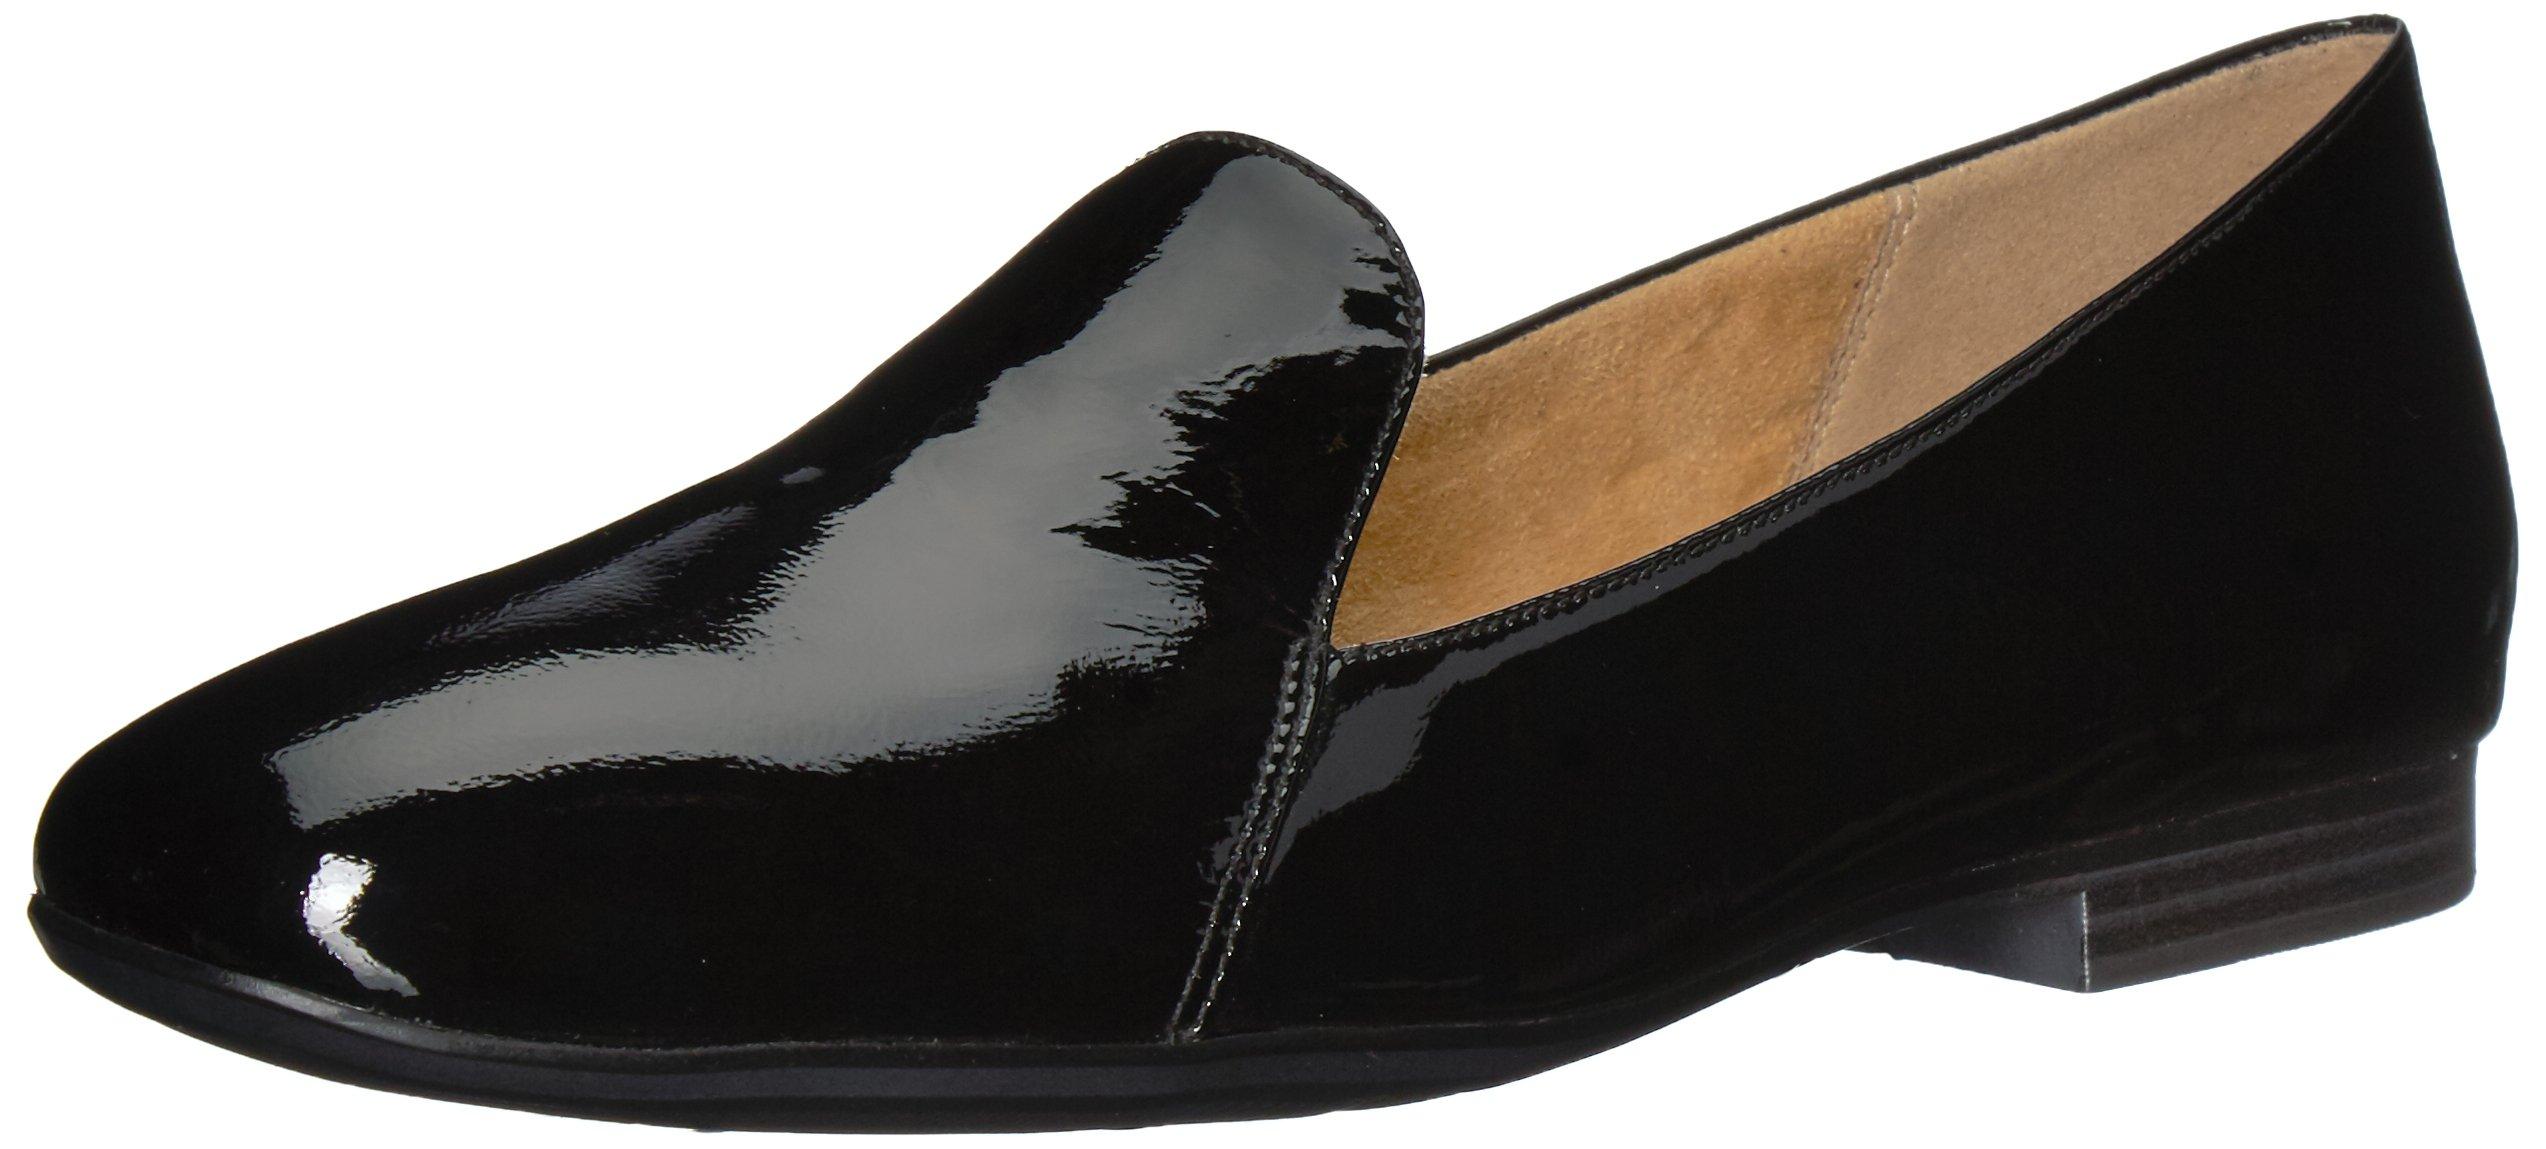 Naturalizer Women's Emiline Loafer Flat, Black Patent, 9 Medium US